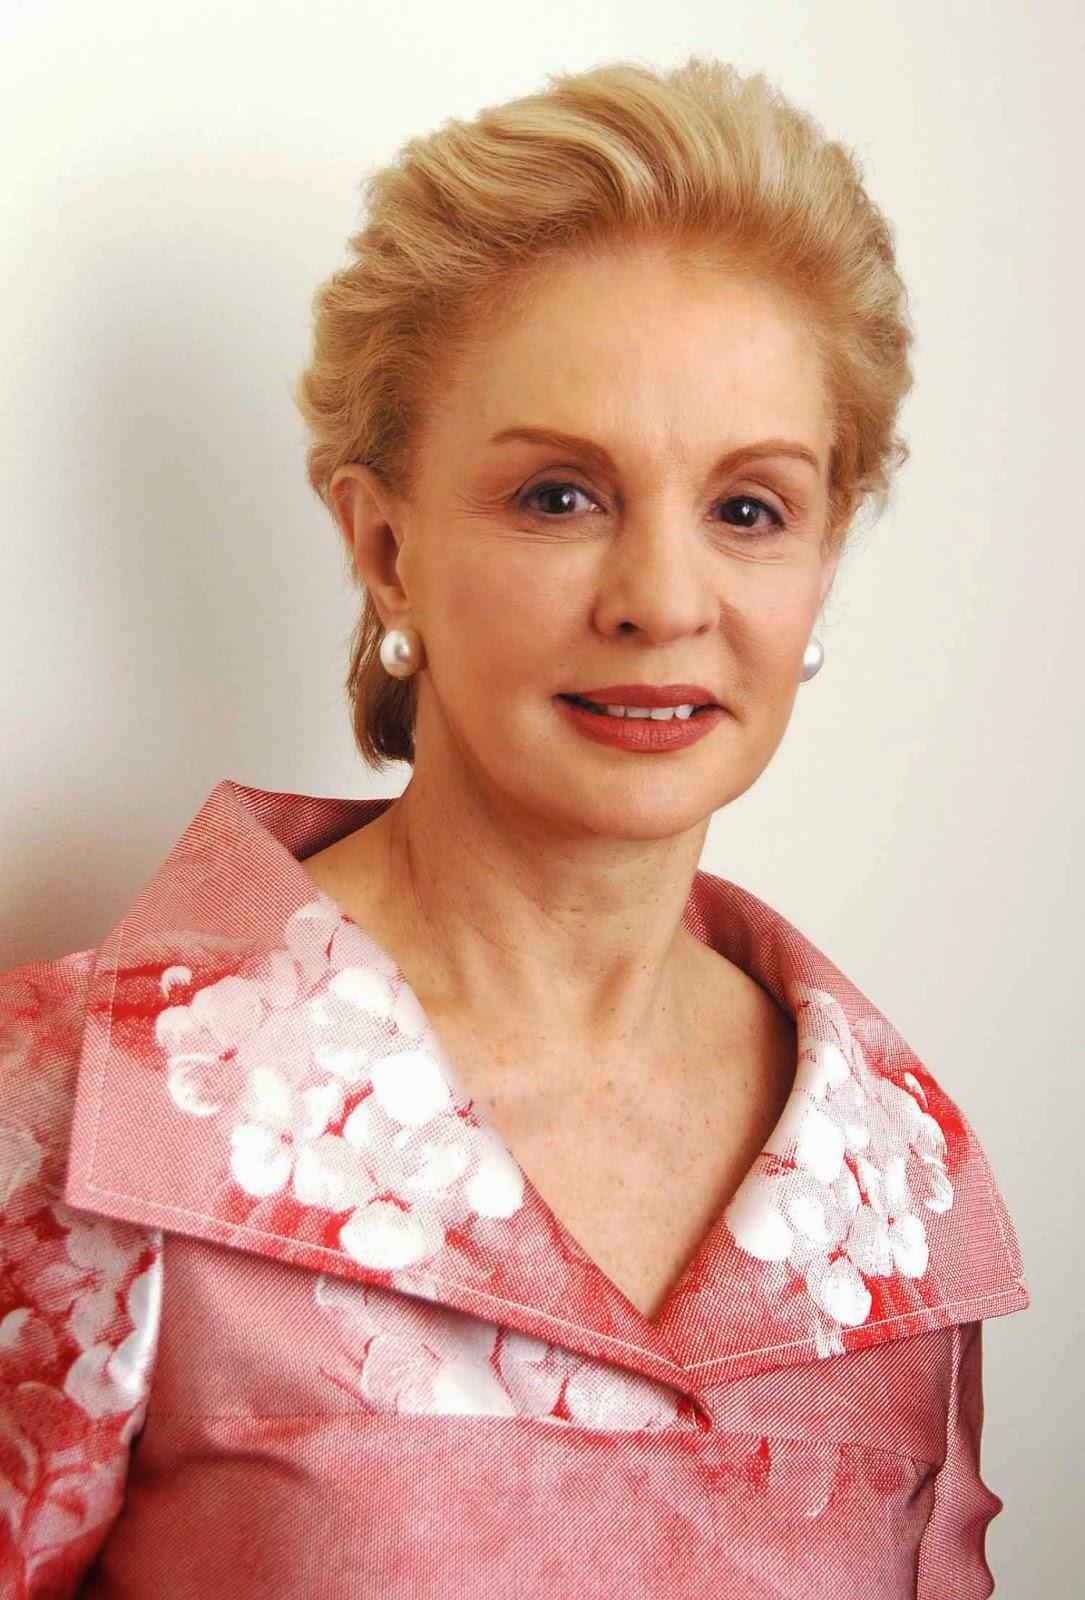 Le BON TON: PREMIO: CAROLINA HERRERA TO BE HONORED WITH ...